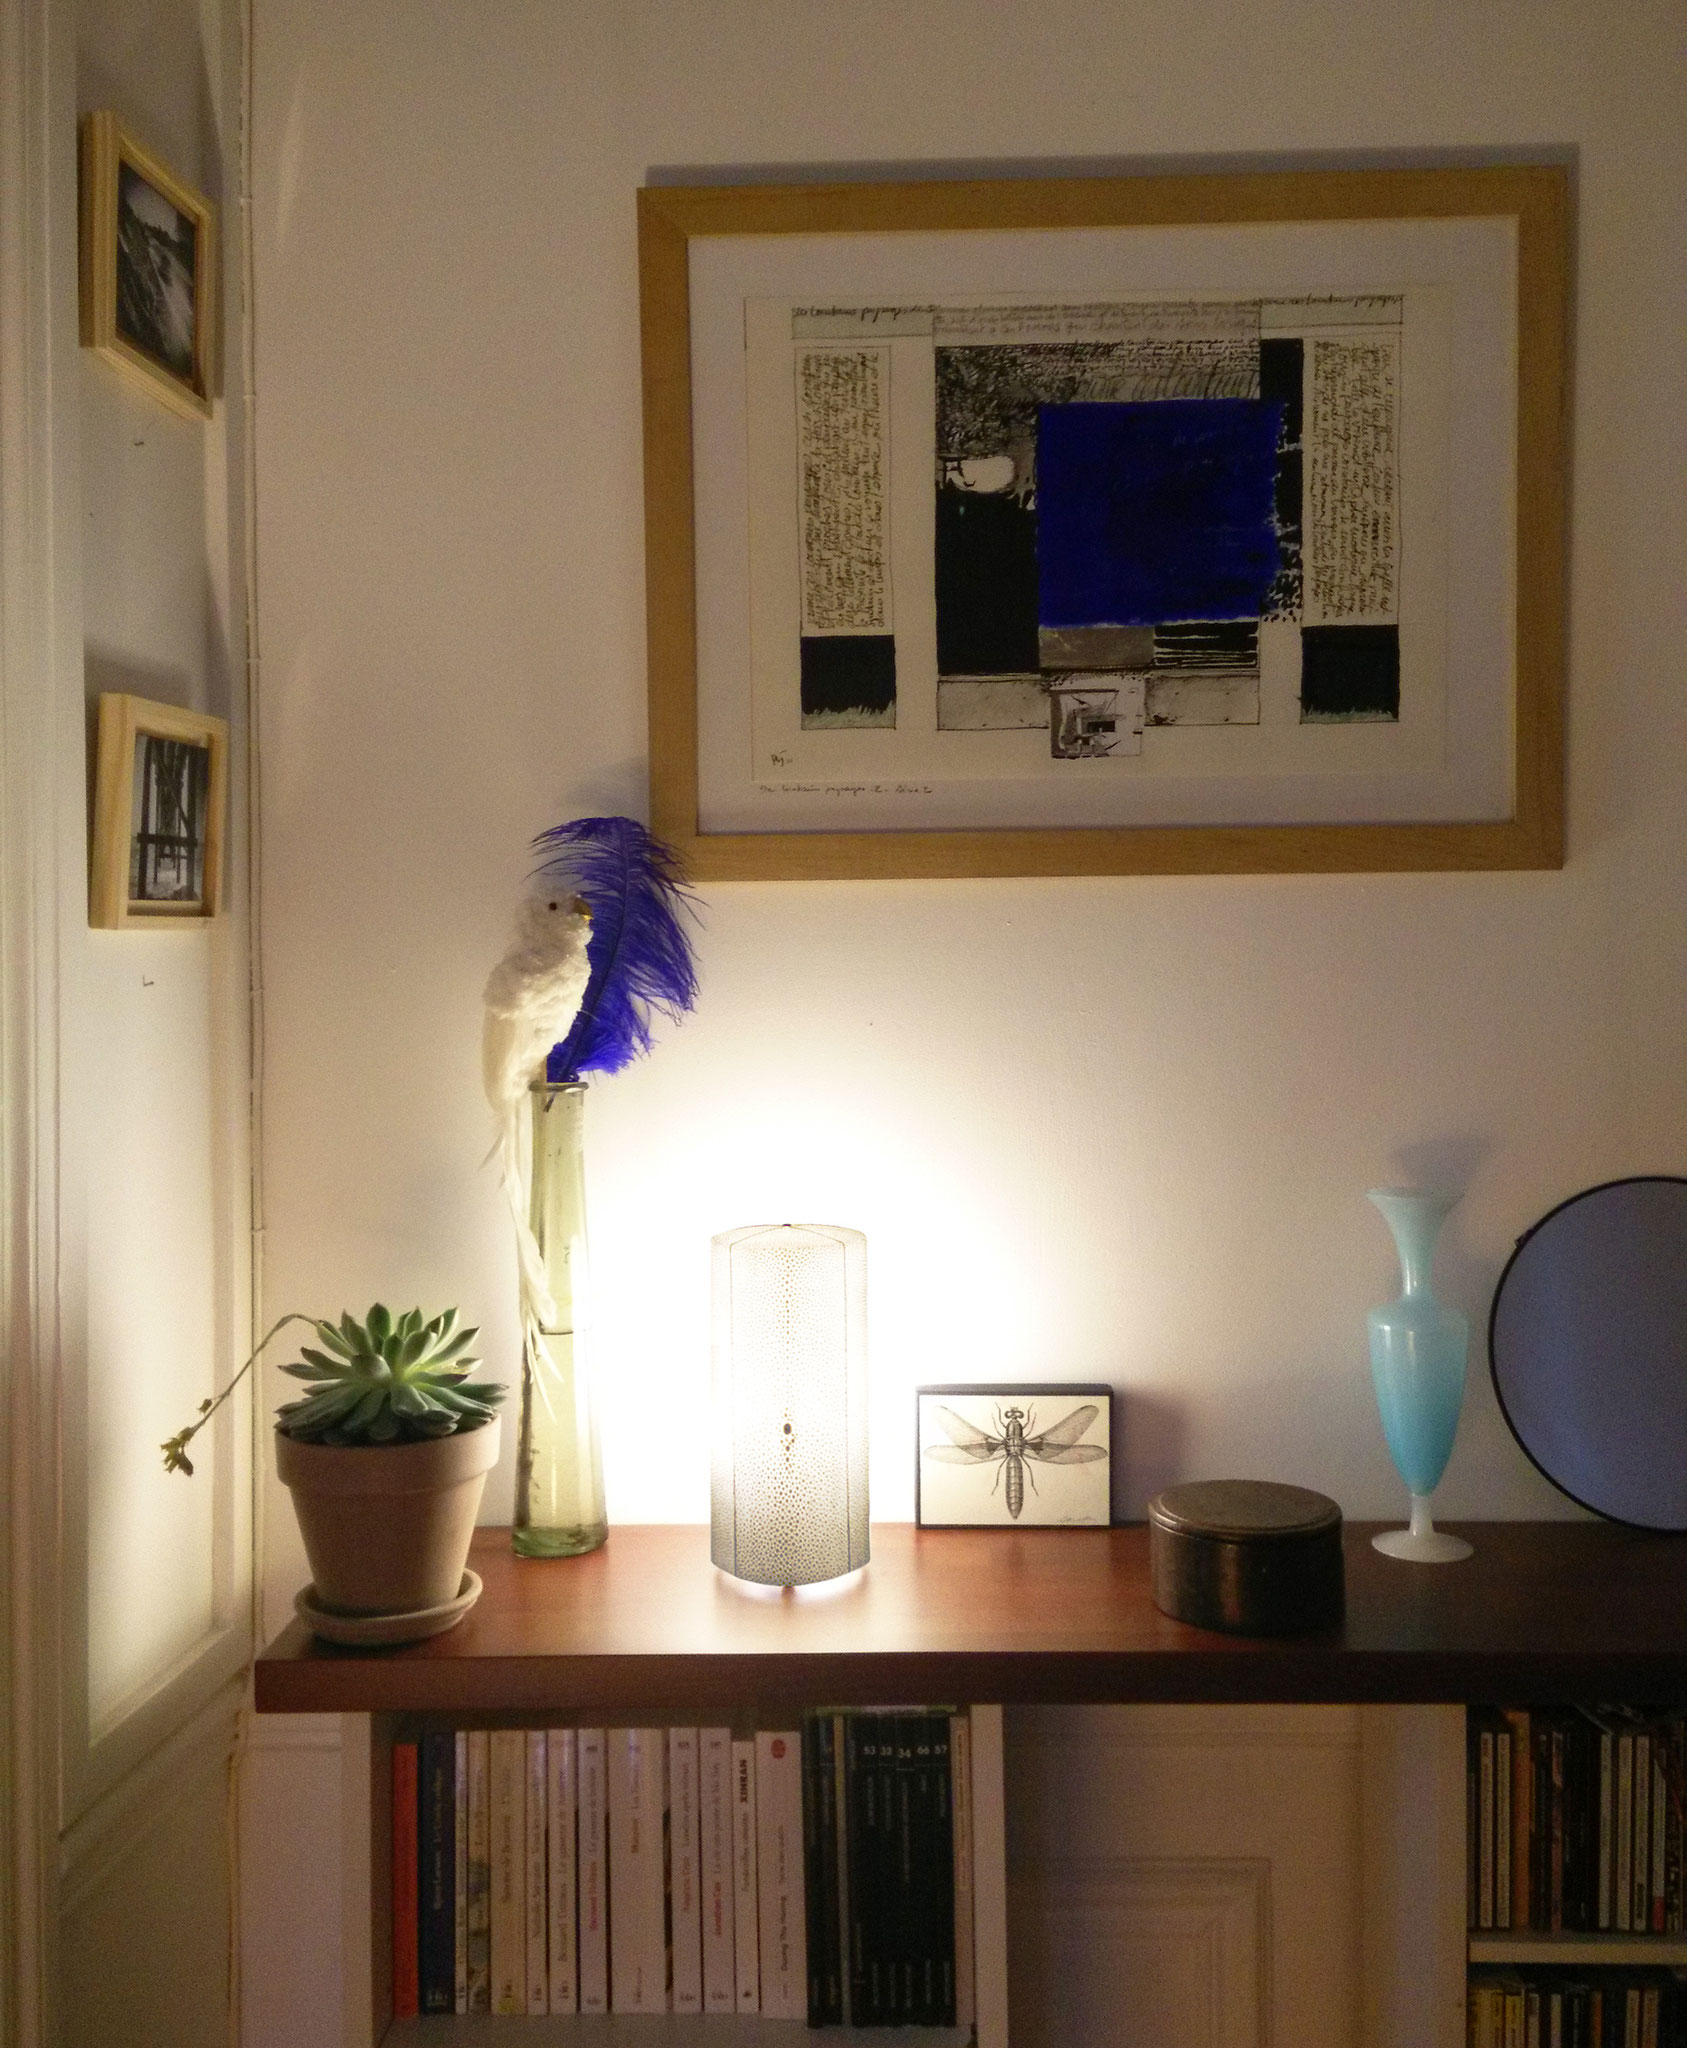 Lampe d'appoint - Collection lampes - particuliers - Paris